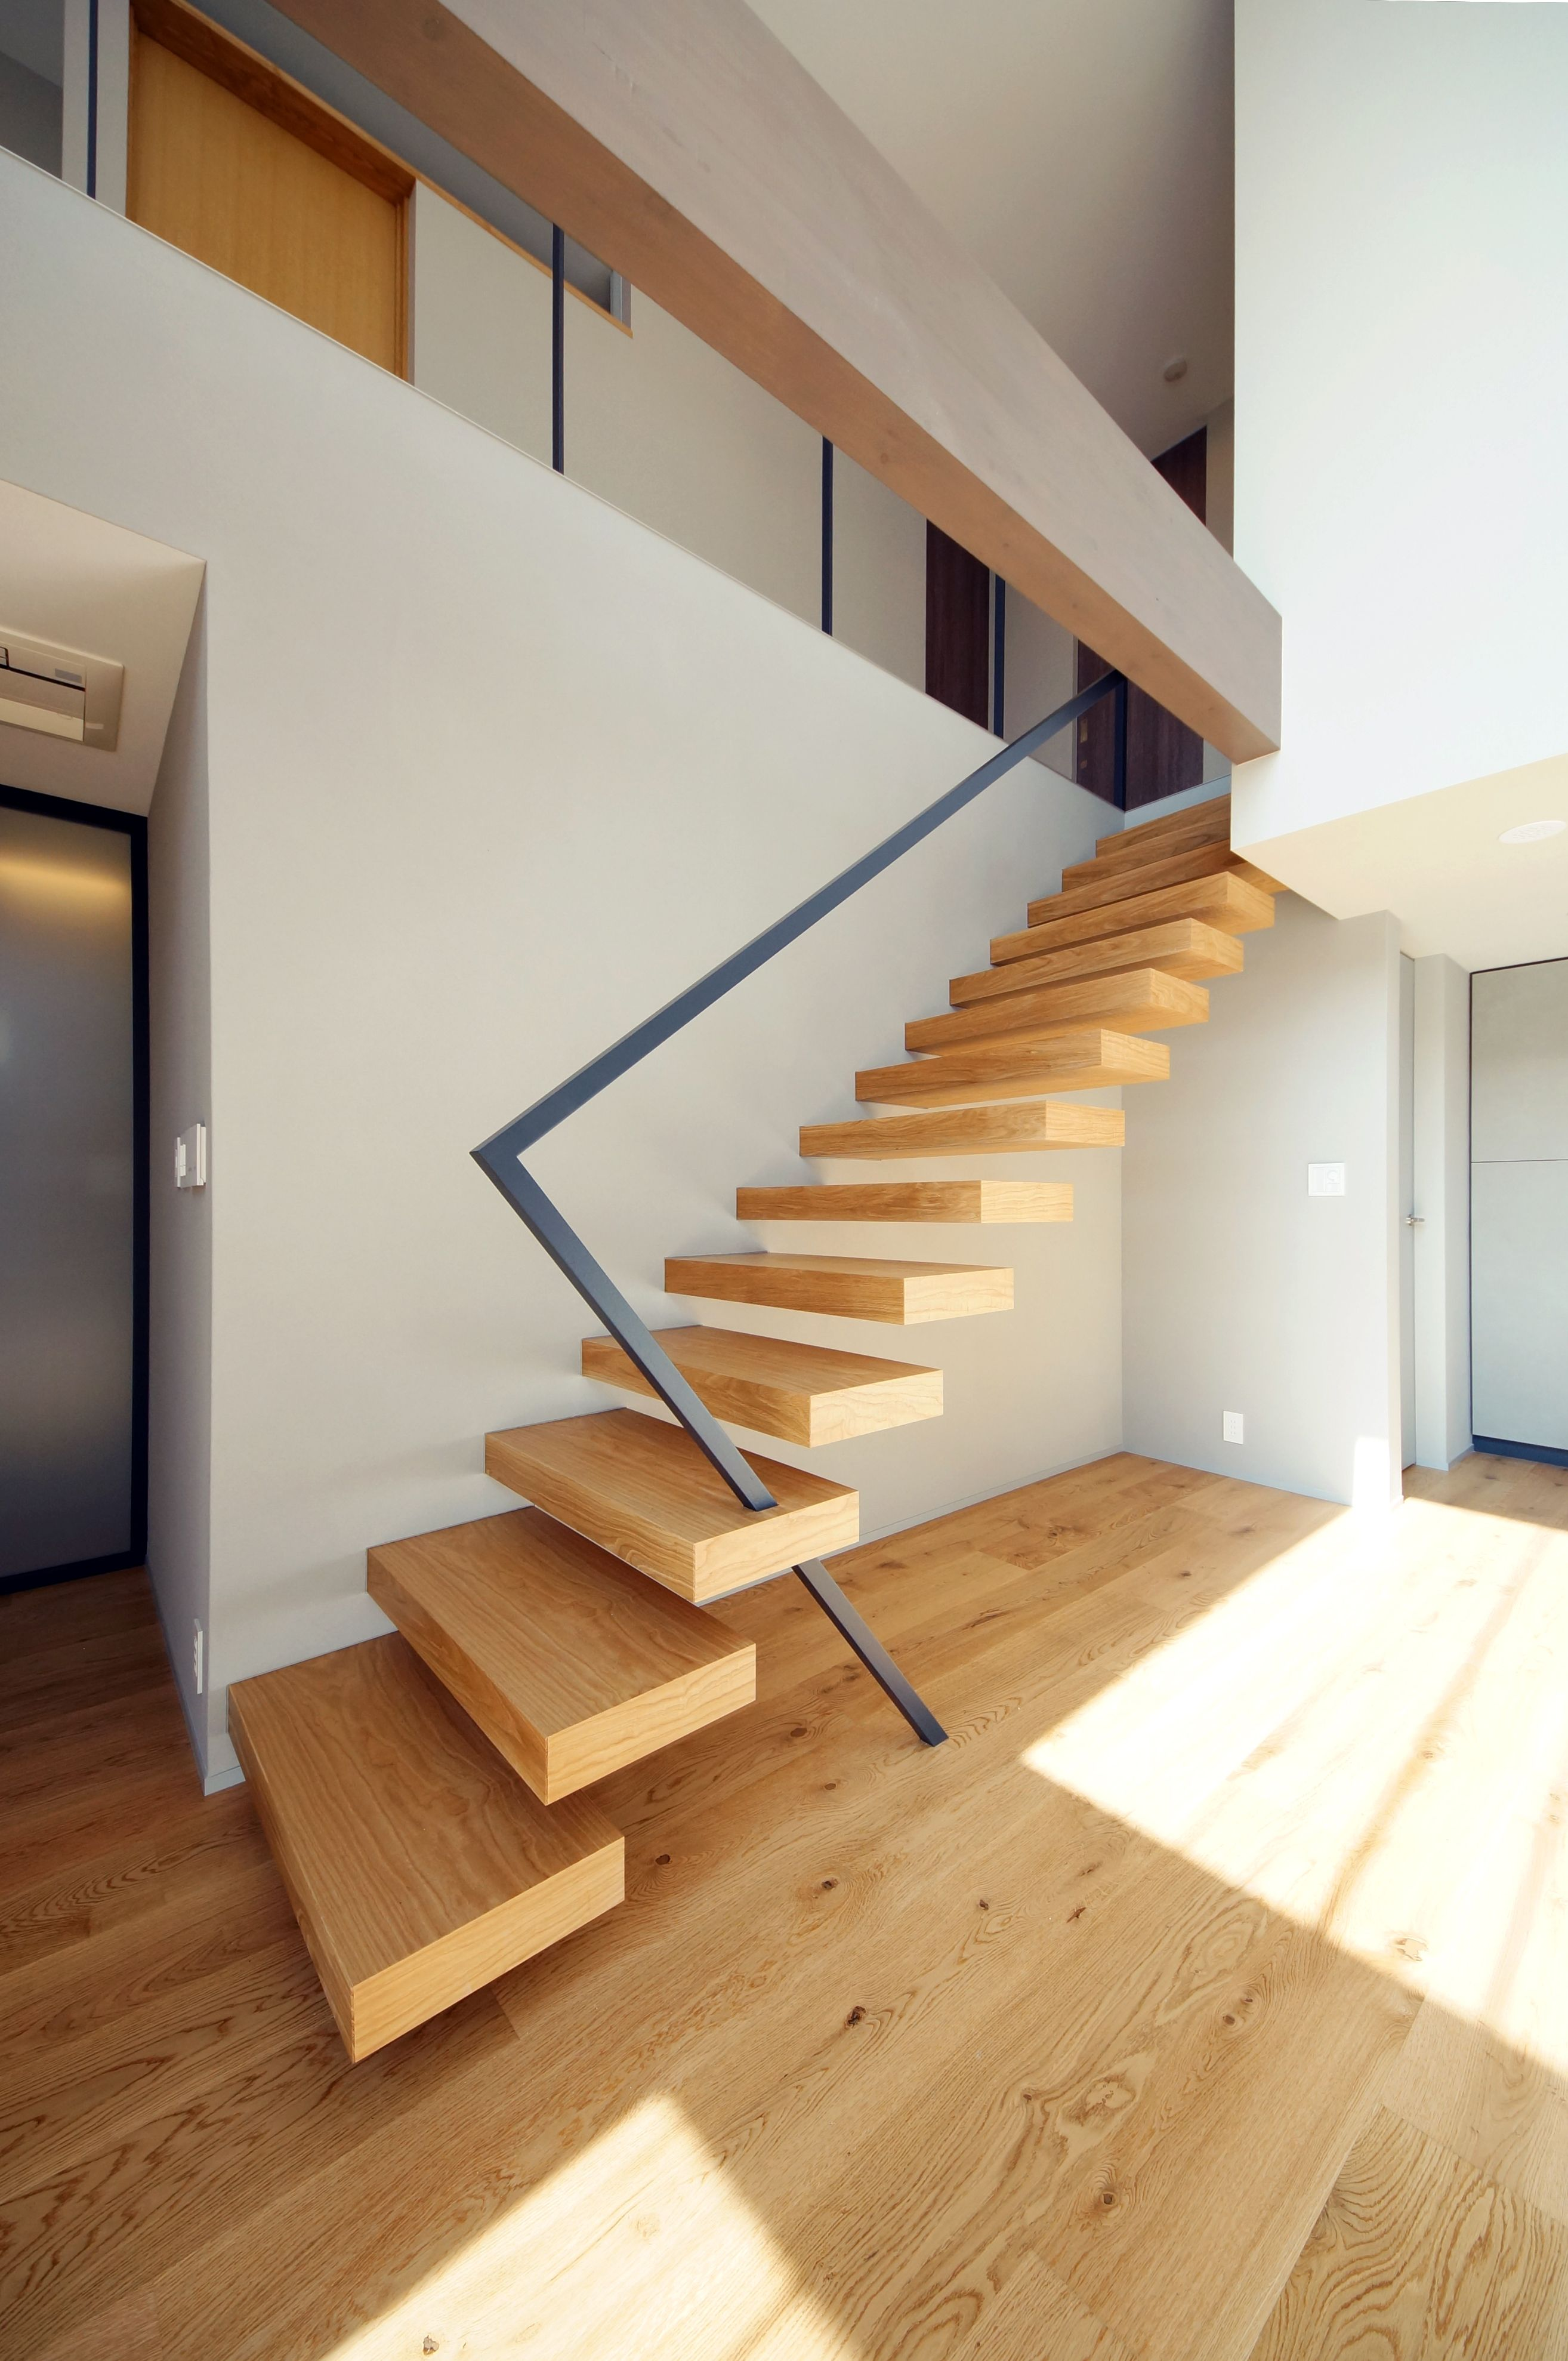 Best Minimal Stairs ミニマルな構成の階段【2019】 モダンステアケース、階段の設計、住宅建築デザイン 400 x 300